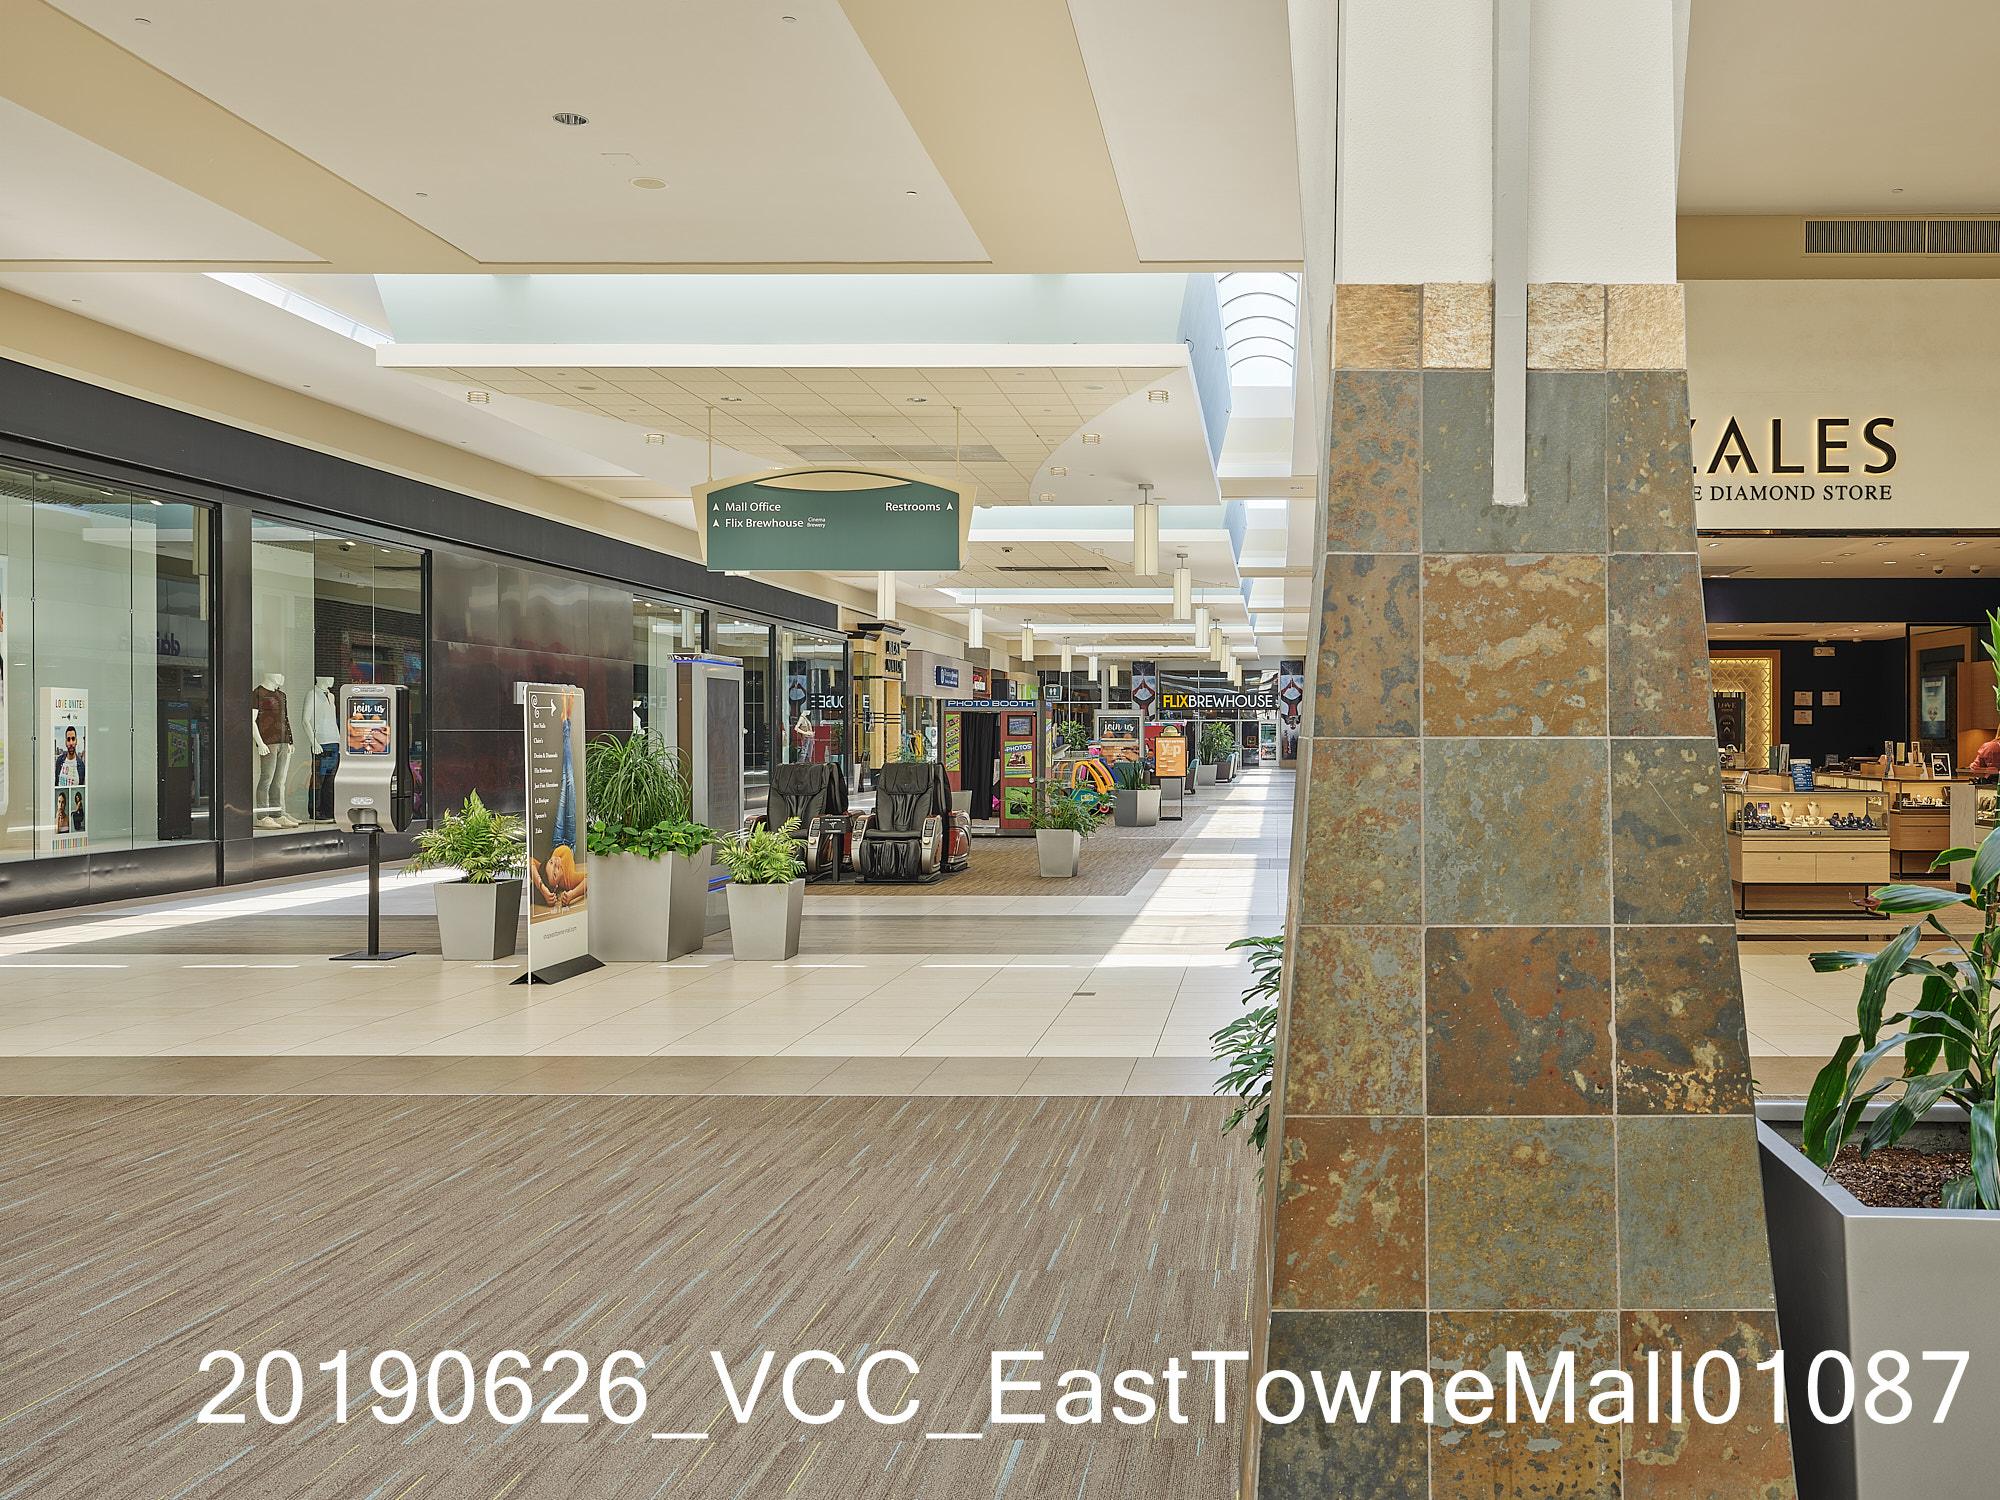 20190626_VCC_EastTowneMall01087.jpg